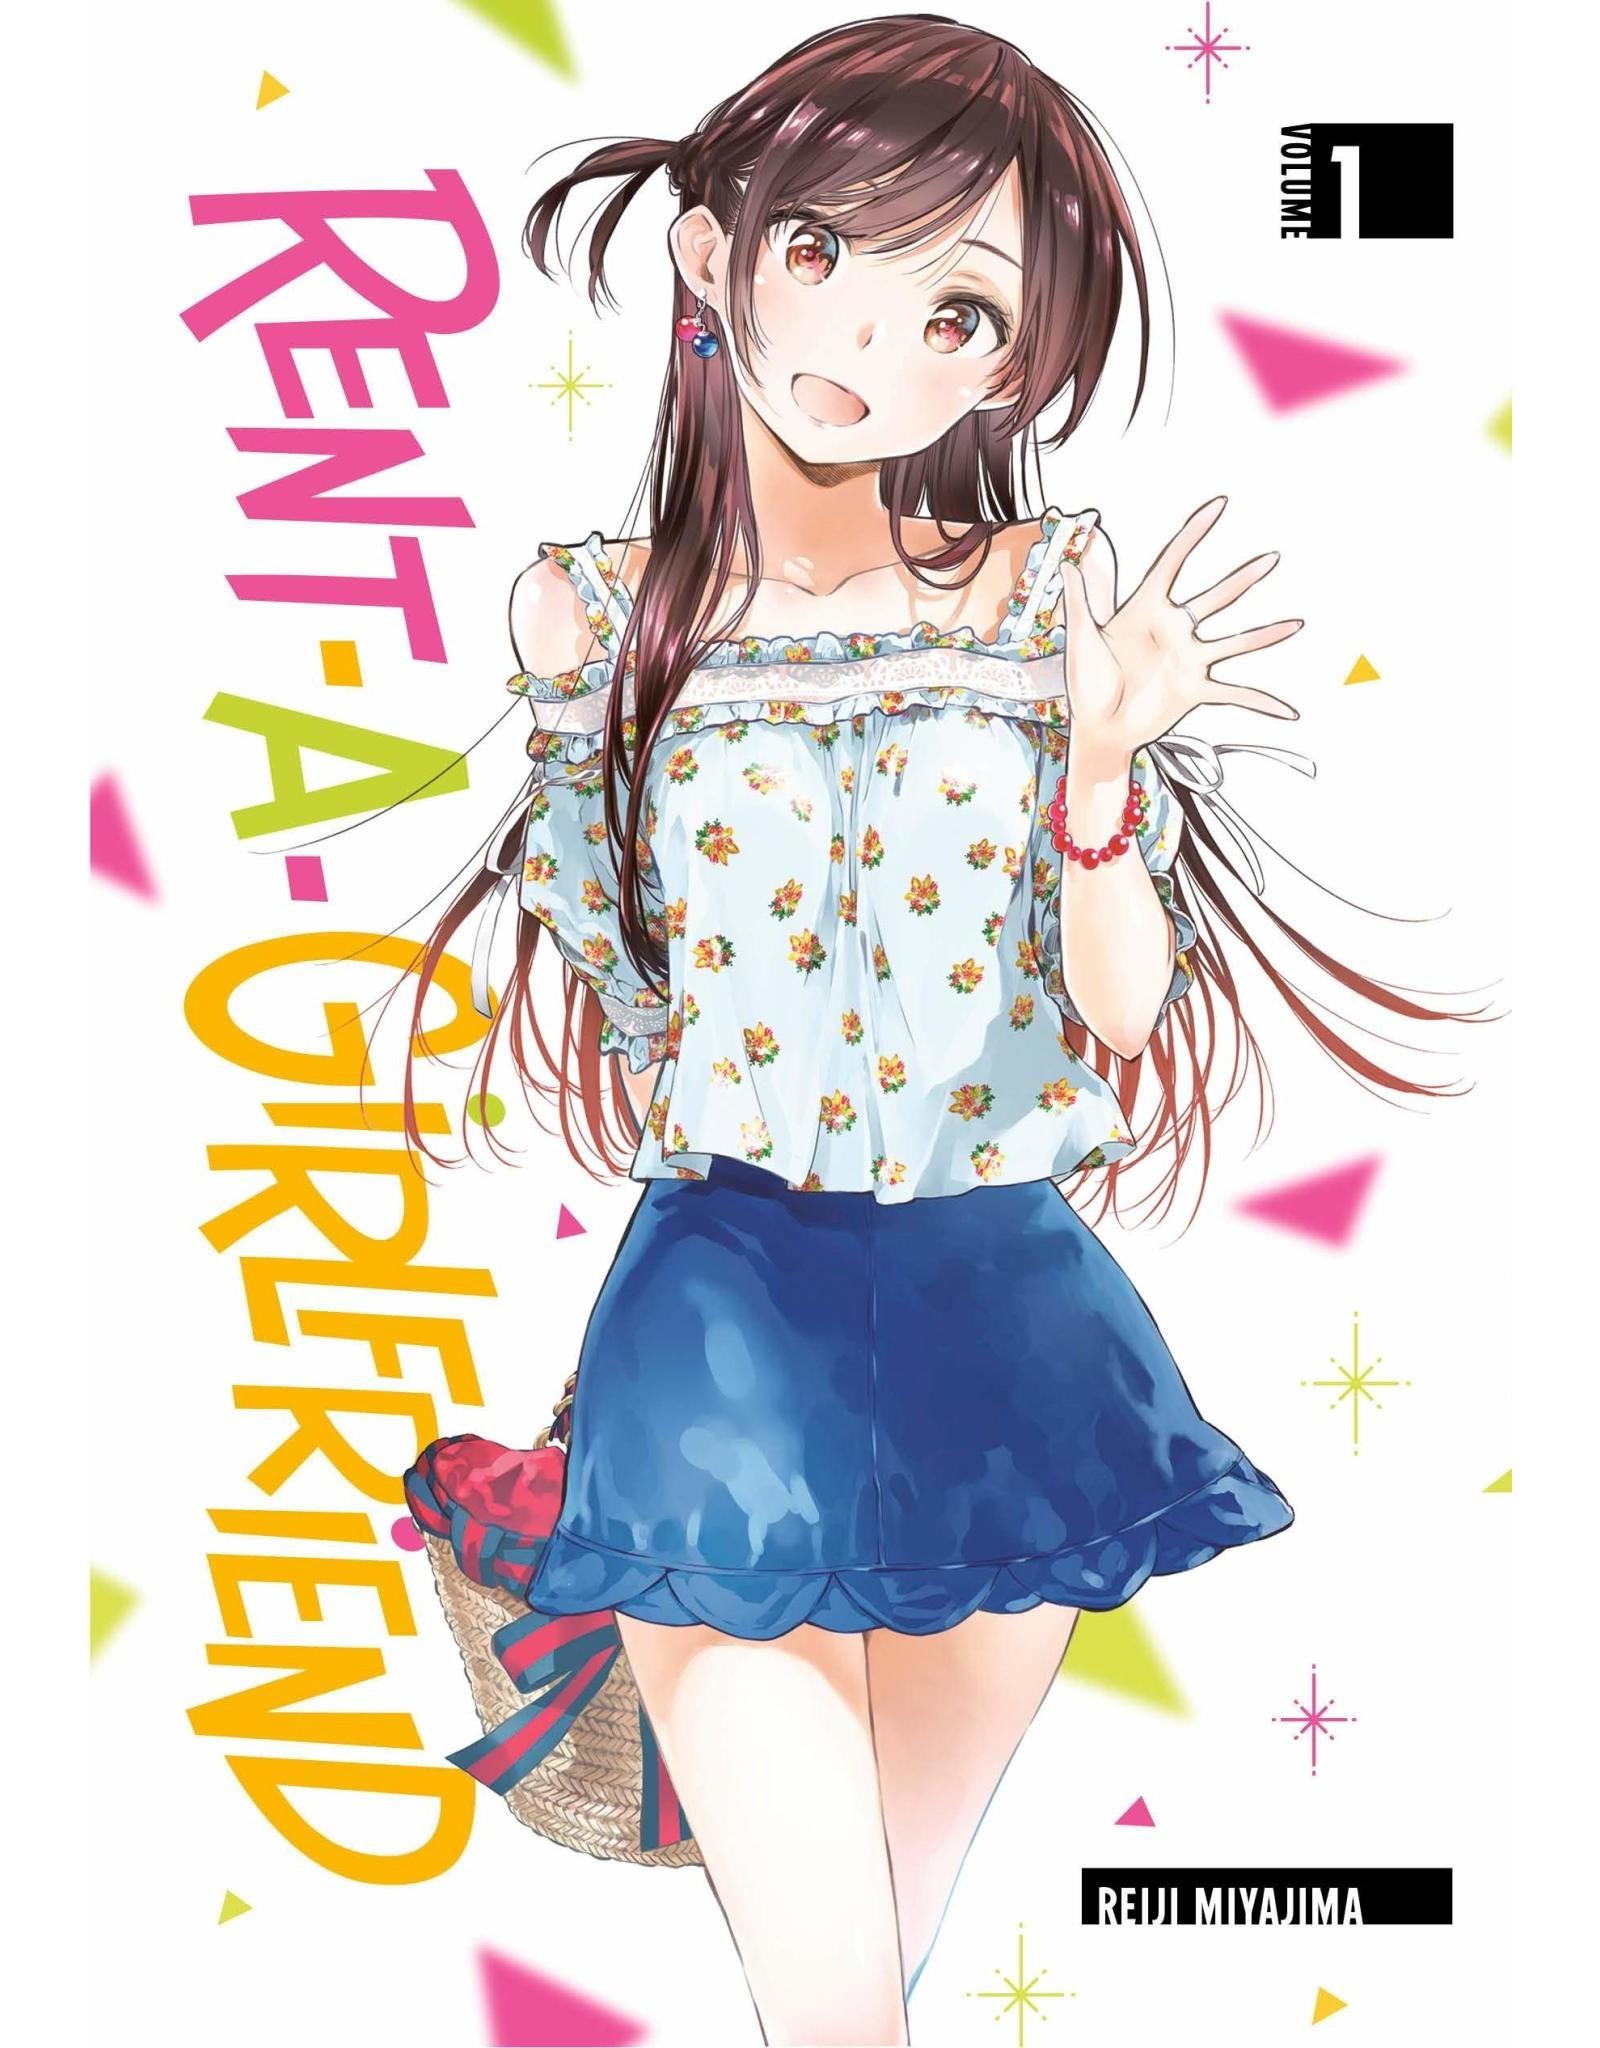 Rent-A-Girlfriend 1 (English)